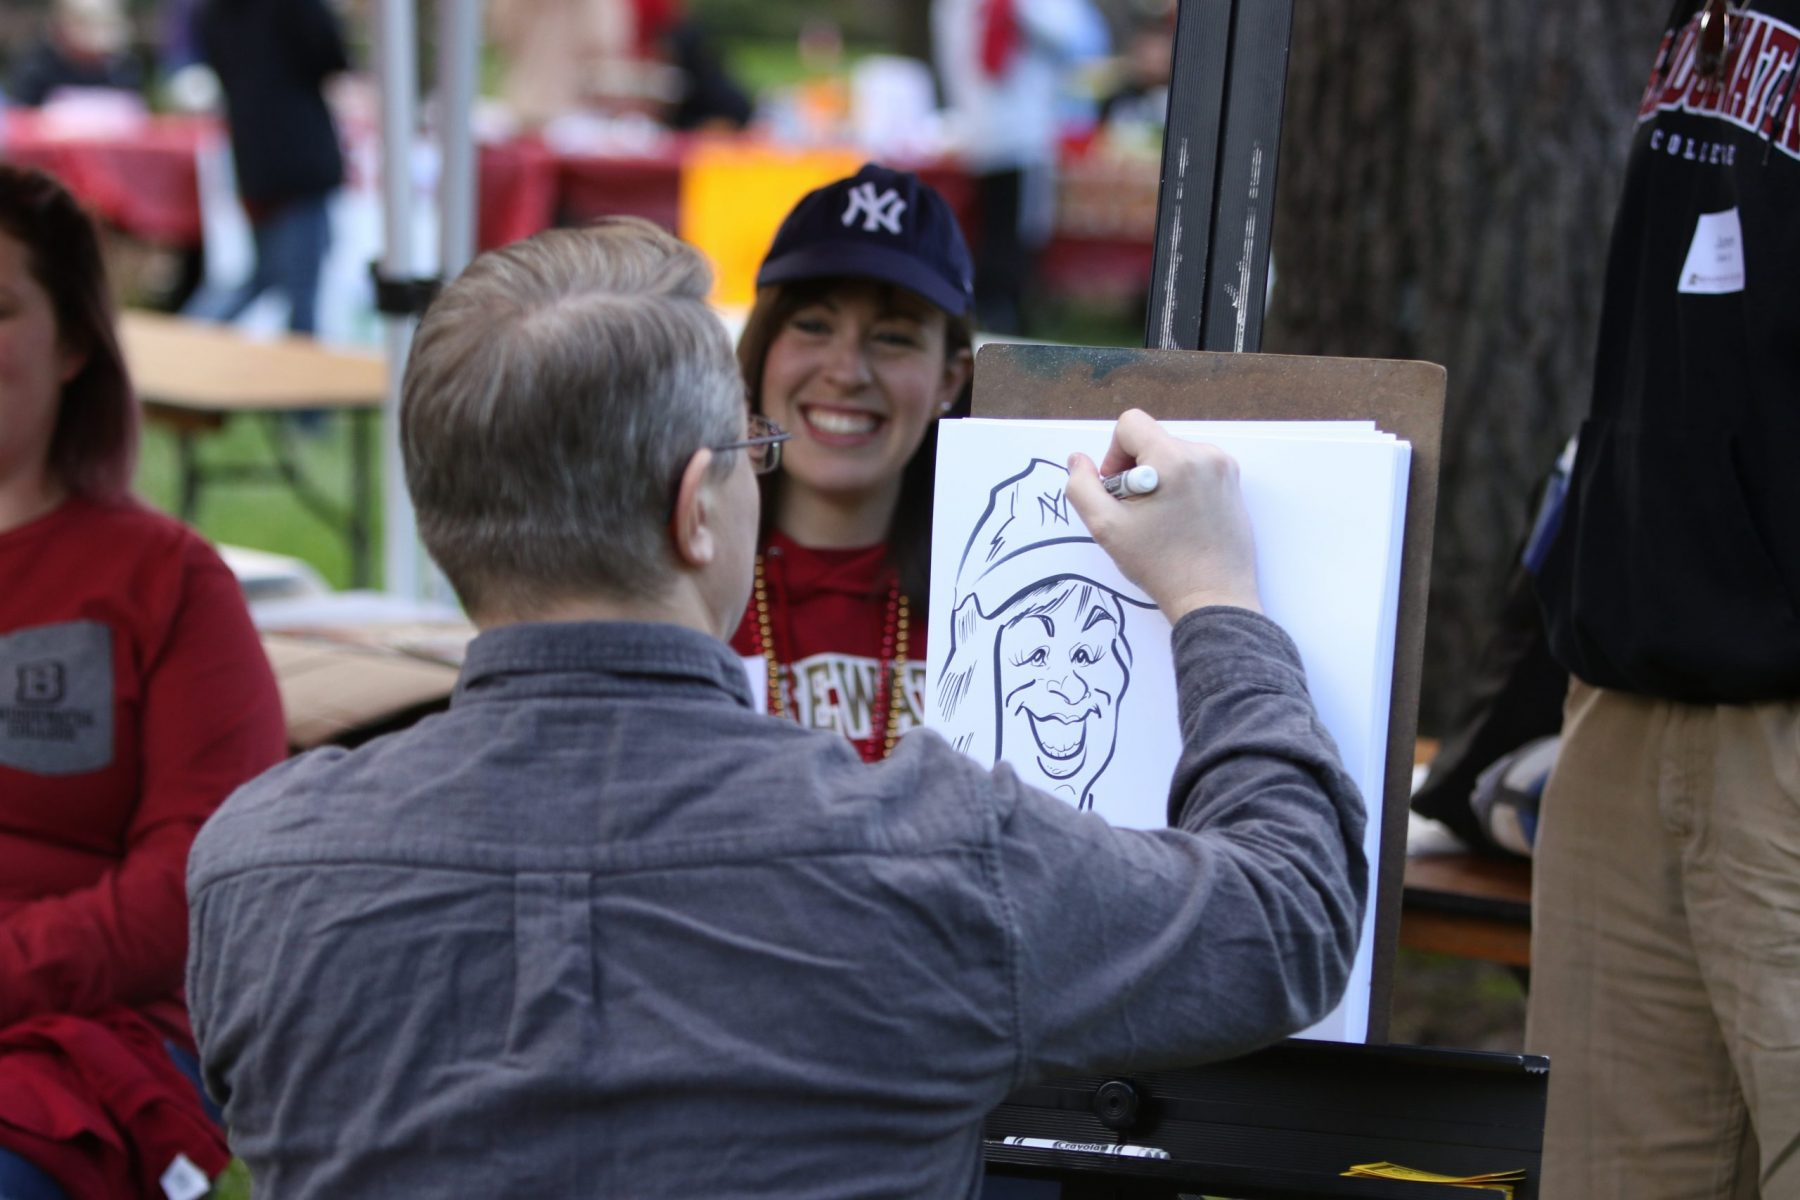 Man sitting down draws photo of woman sitting down